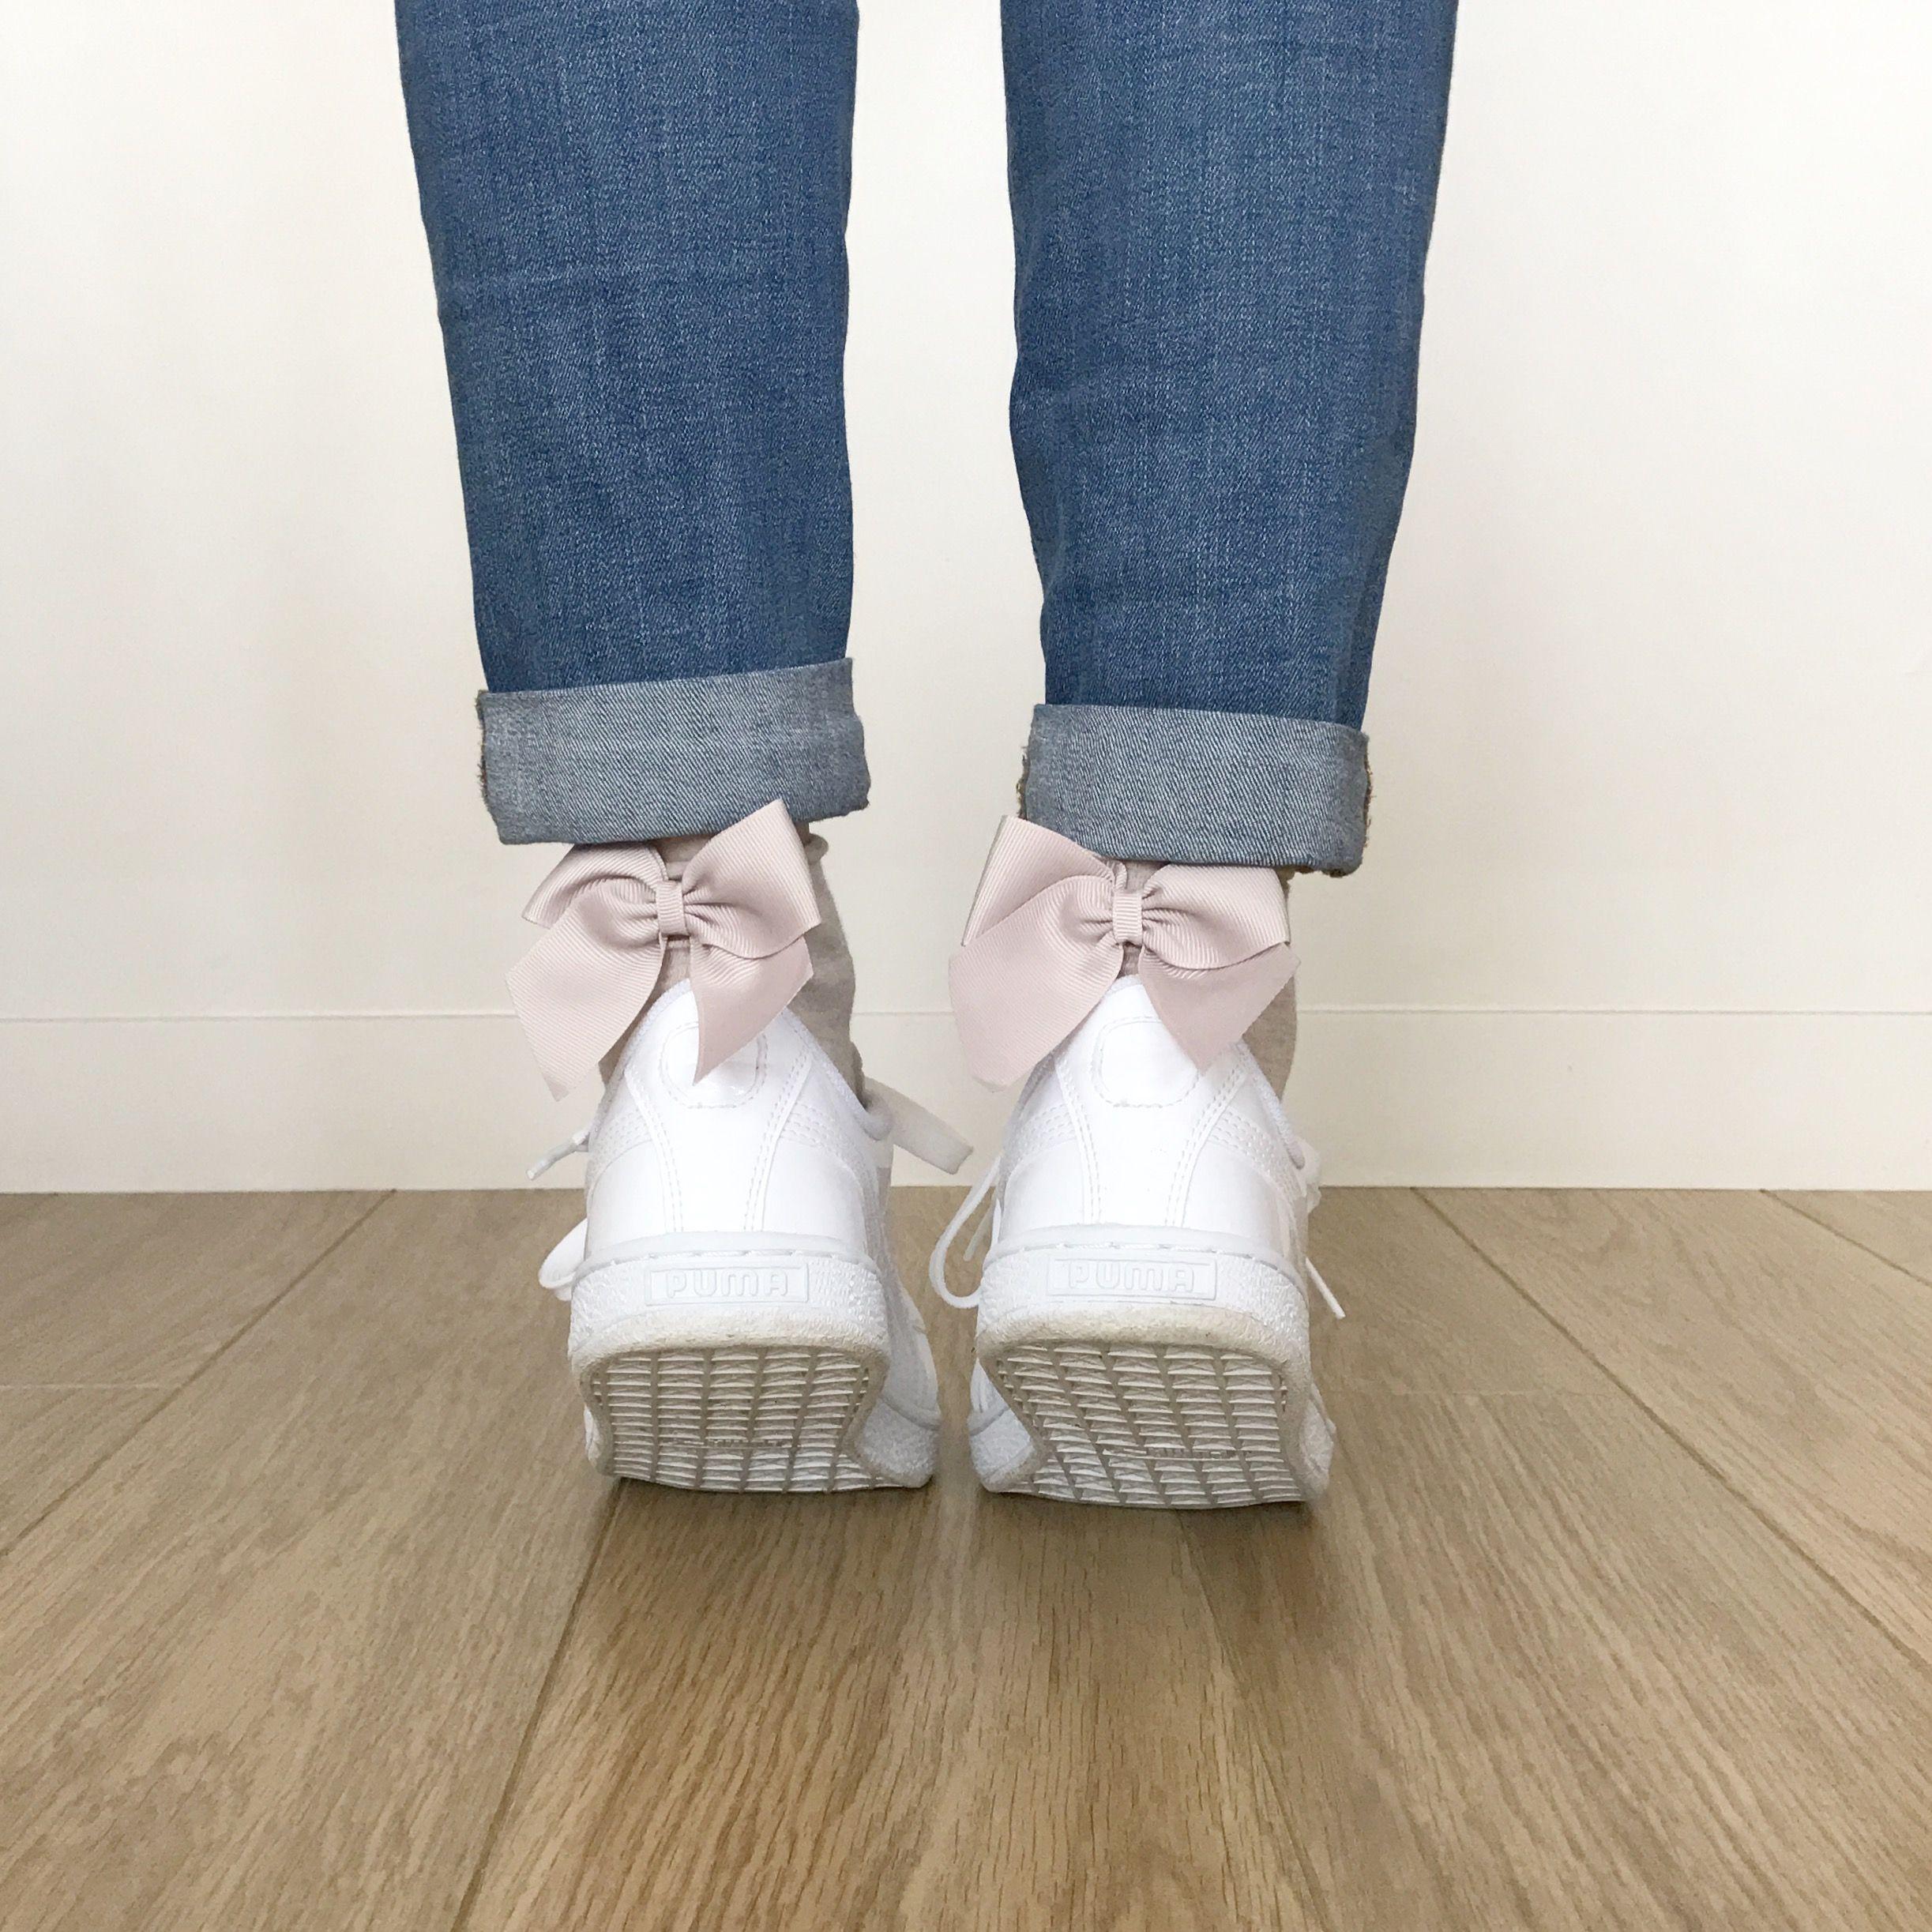 puma et chaussettes noeuds calzedonia baskets tendances pinterest pumas. Black Bedroom Furniture Sets. Home Design Ideas